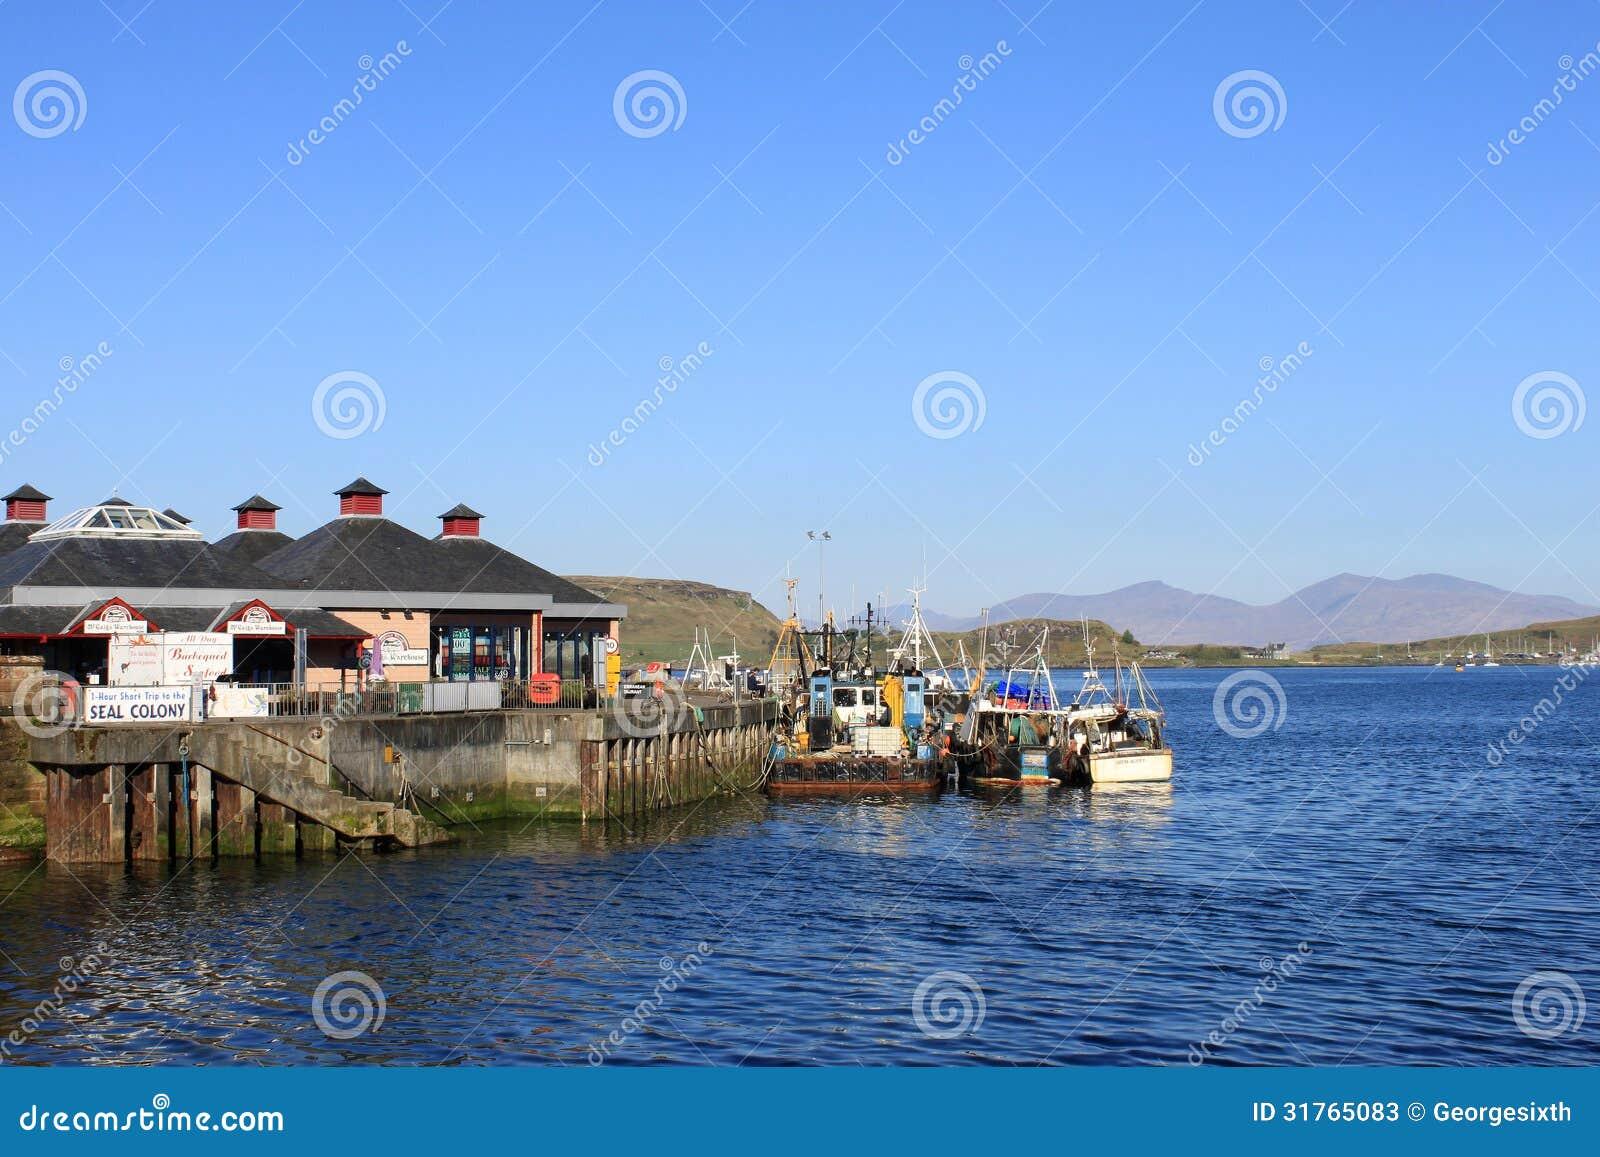 Island Of Bute Ferry